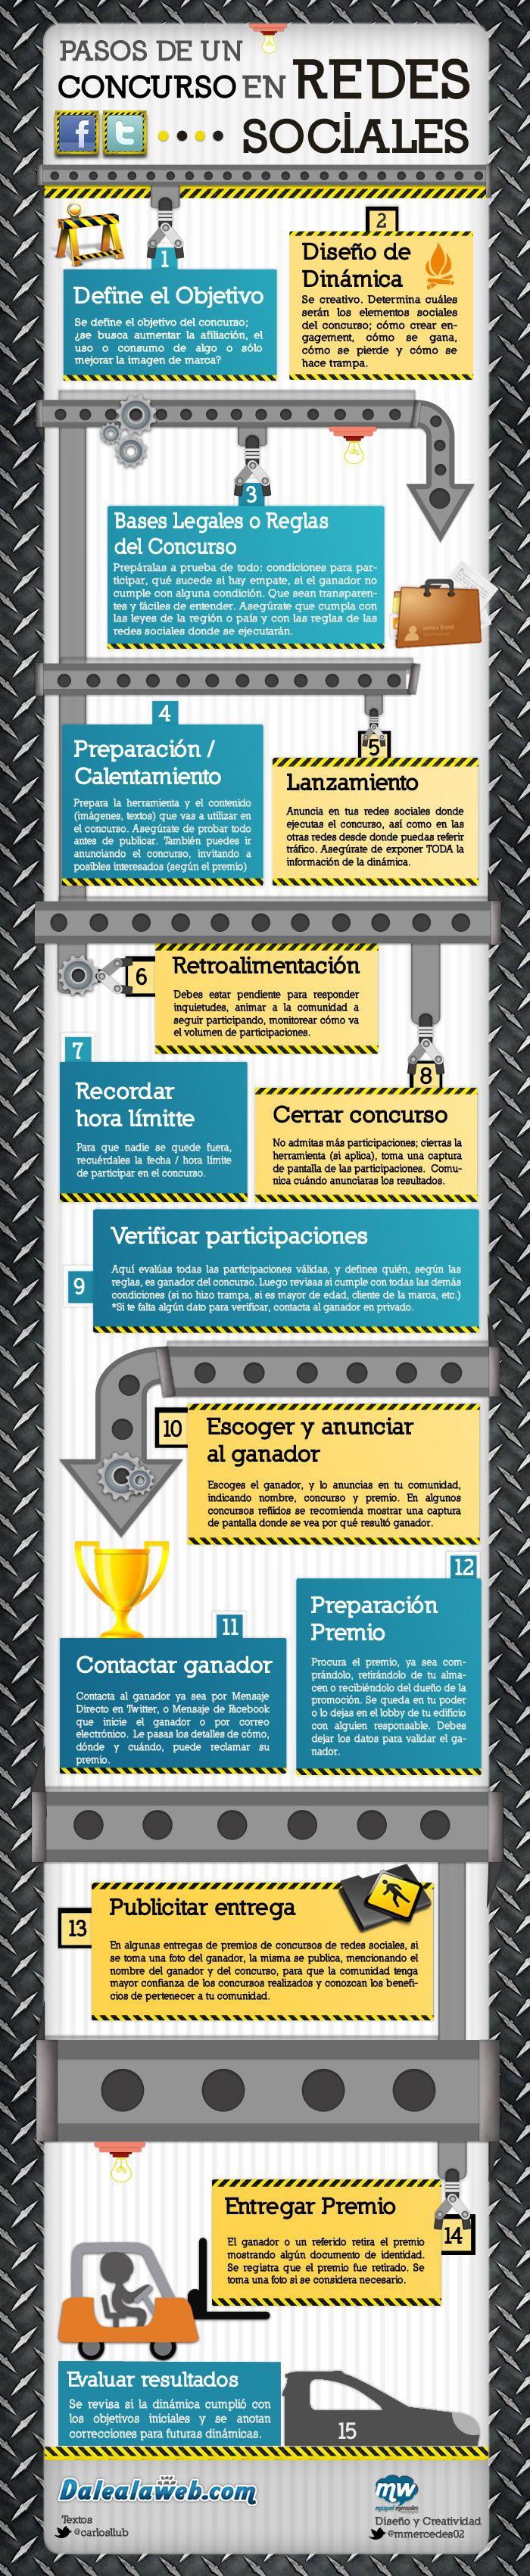 Pasos para realizar un concurso en Redes Sociales #infografia #Marketing #CM